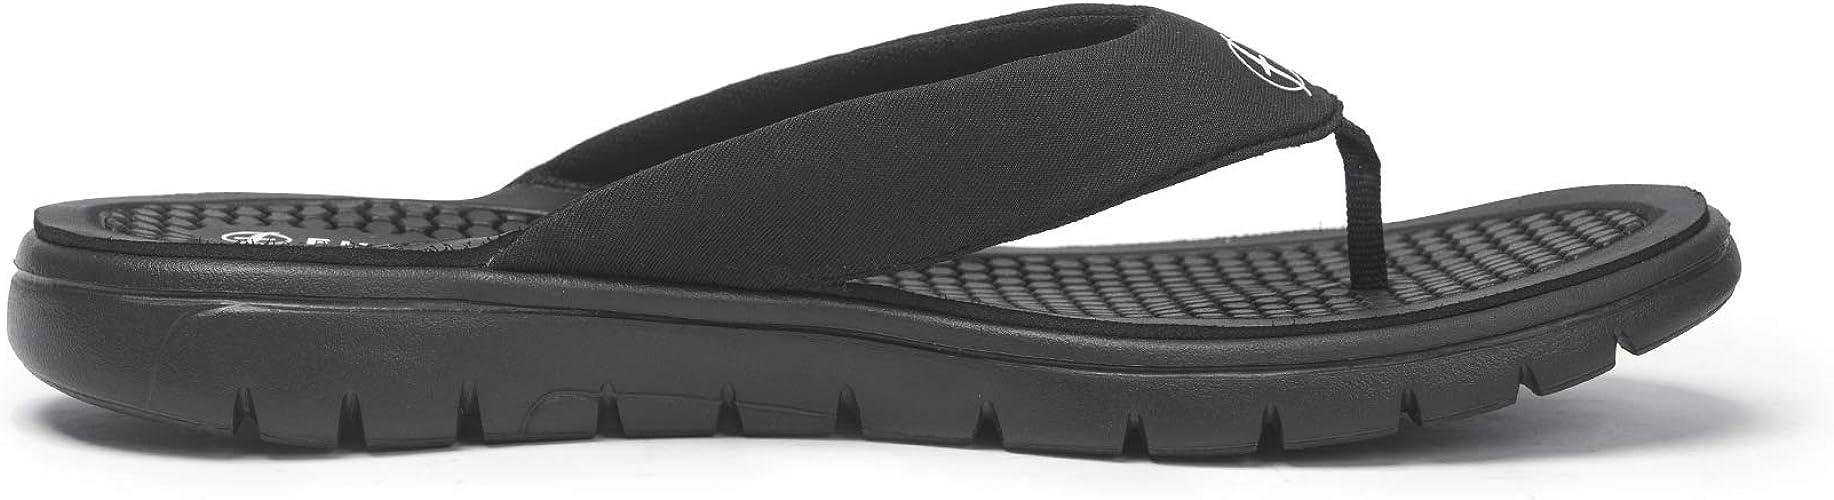 Womens Inblu BM000033 Black Thong Flip Flop Comfort Sandals Size